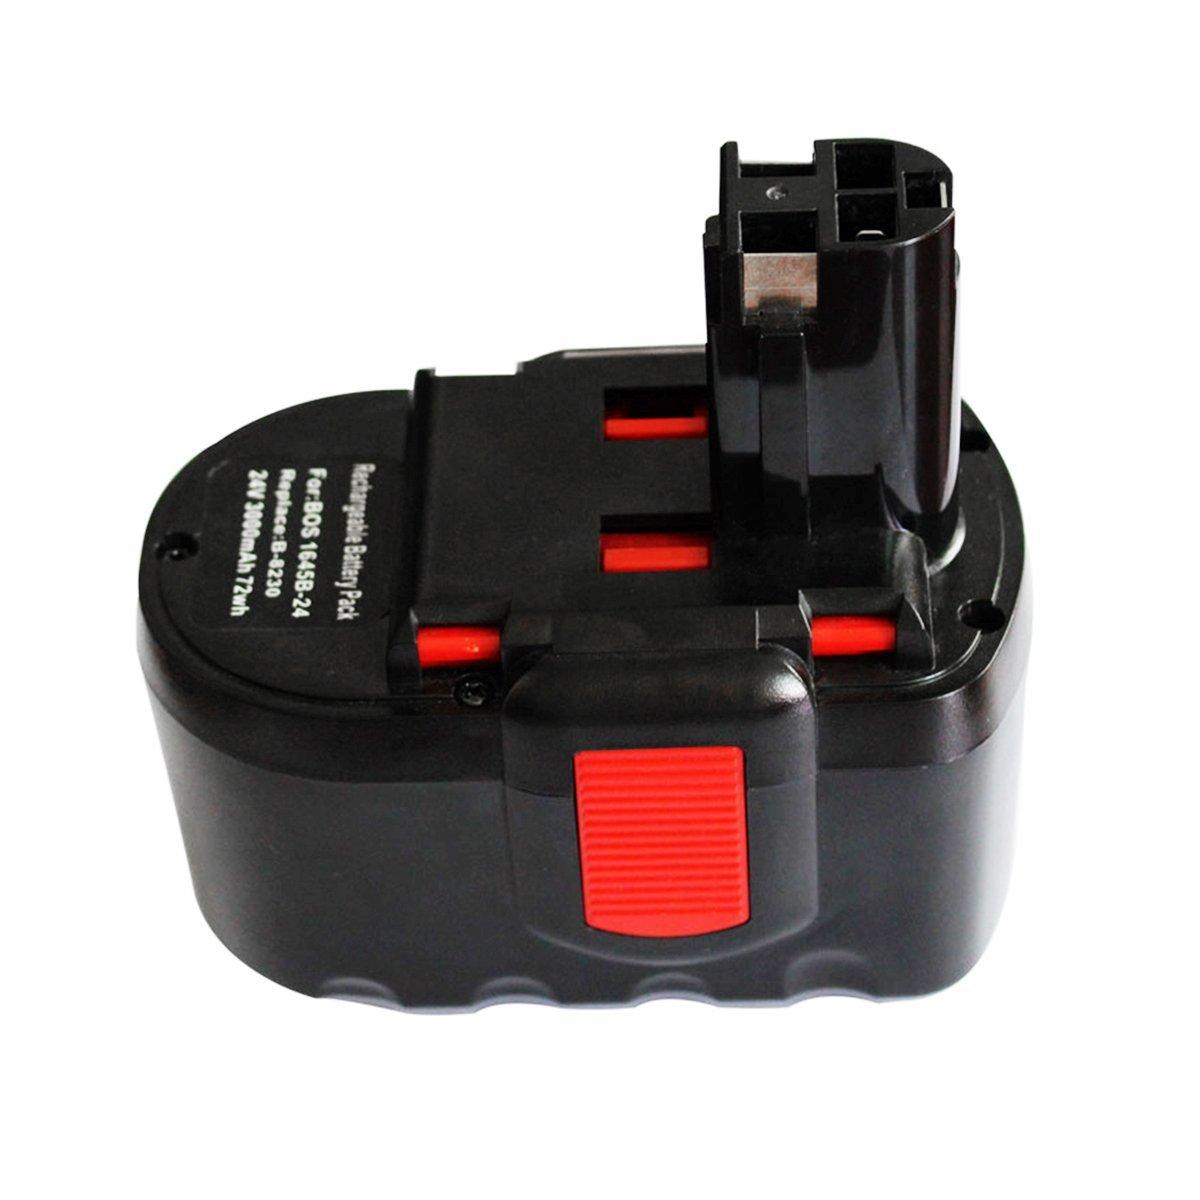 Electropan 24V 3.0Ah Li-Ion Replacement Battery for Bosch B-8230 BAT030 BAT031 BAT240 BAT299 BH-2424 BTP1005 Cordless Power Tools